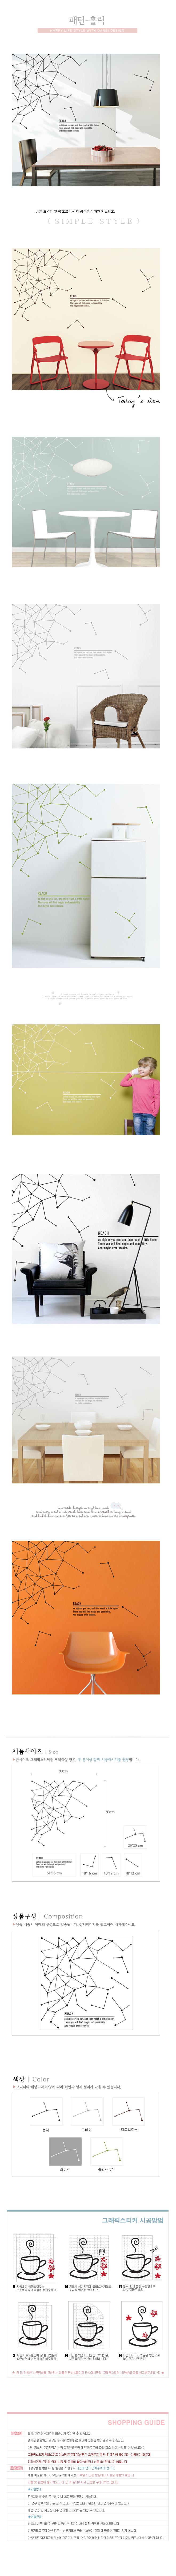 (LU-B57) 패턴-홀릭30,000원-단비디자인인테리어/플라워, 월데코, 월데코 스티커, 모던/심플바보사랑(LU-B57) 패턴-홀릭30,000원-단비디자인인테리어/플라워, 월데코, 월데코 스티커, 모던/심플바보사랑